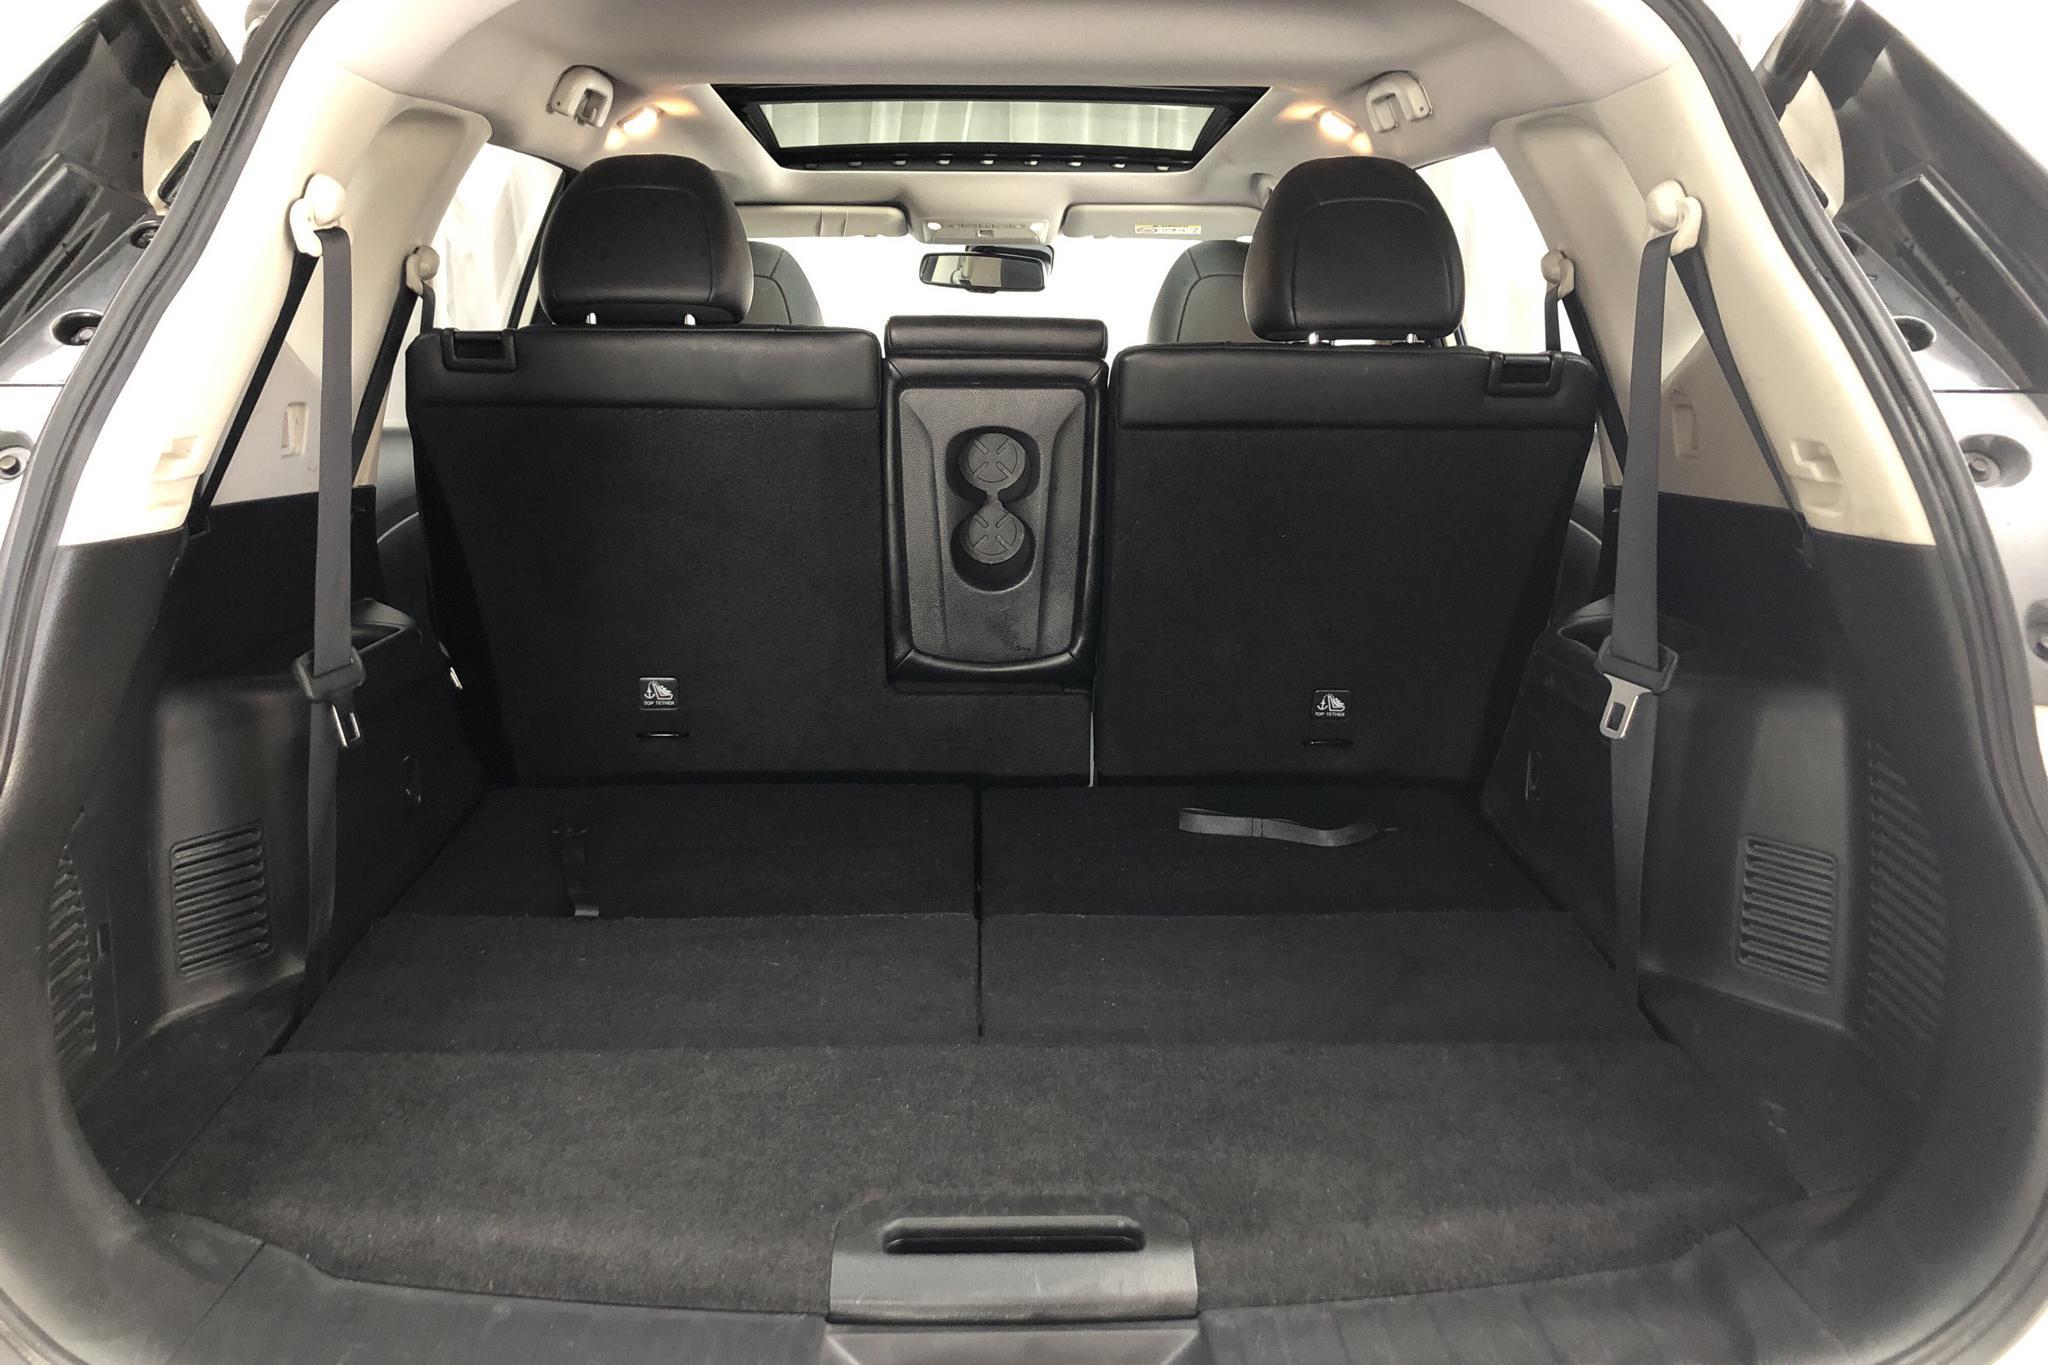 Nissan X-trail 1.6 dCi 2WD (130hk) - 98 670 km - Automatic - white - 2017